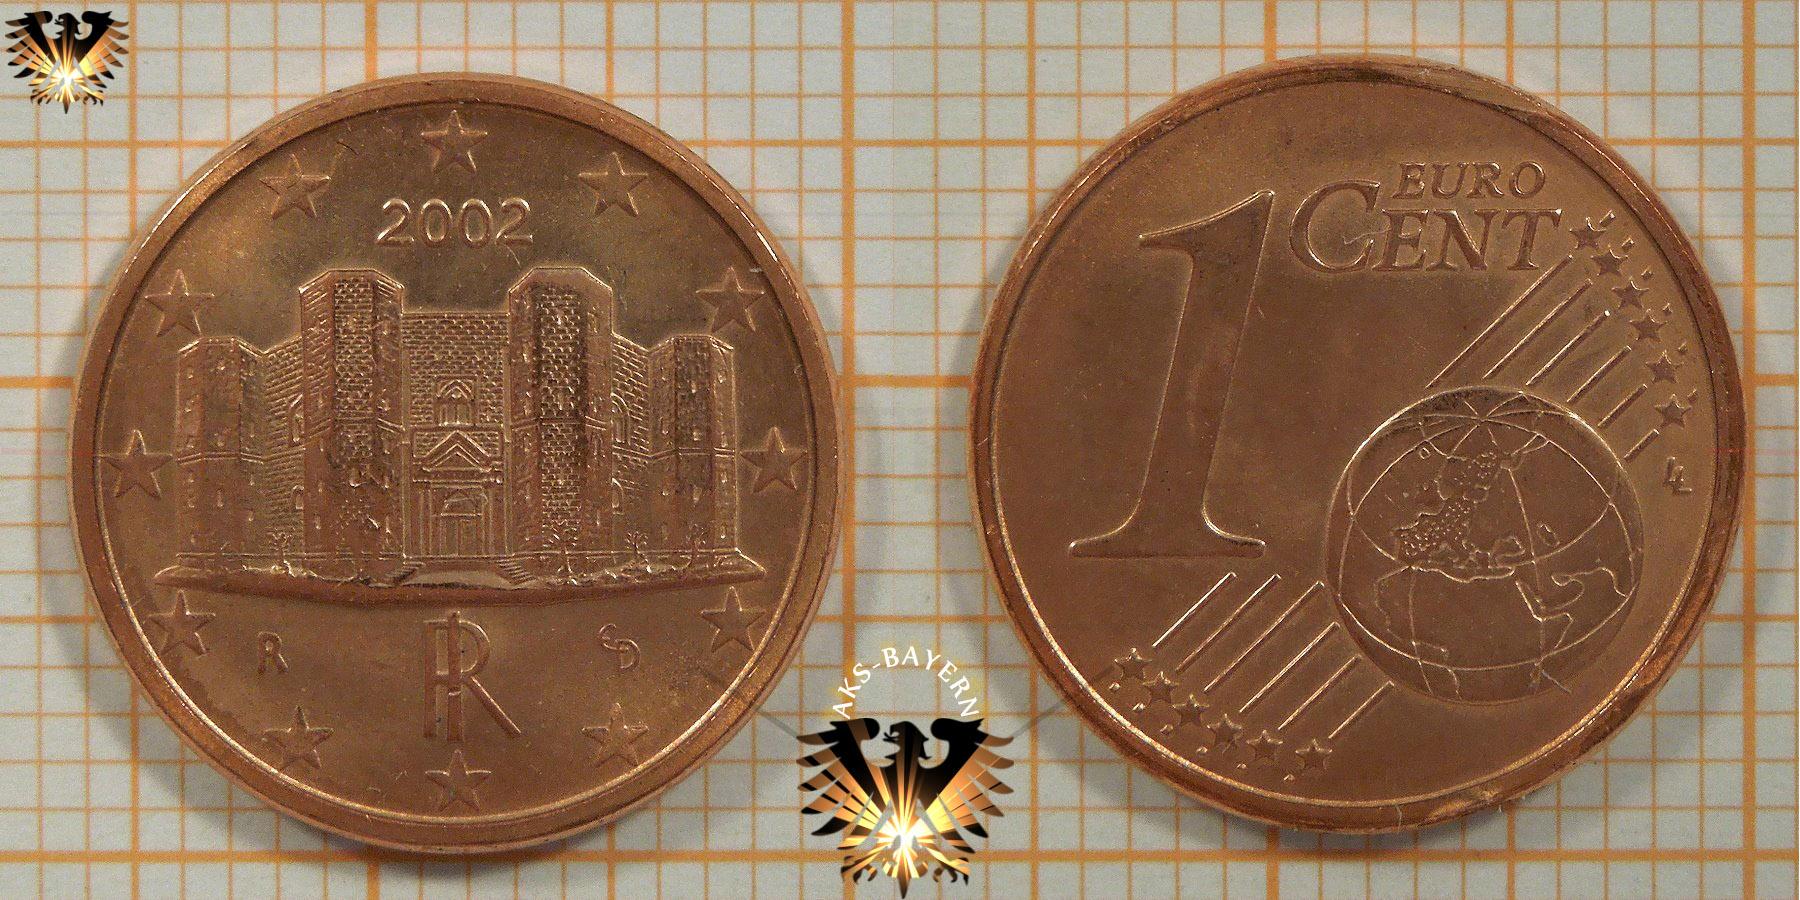 1 Euro Cent Italien 2002 Nominal